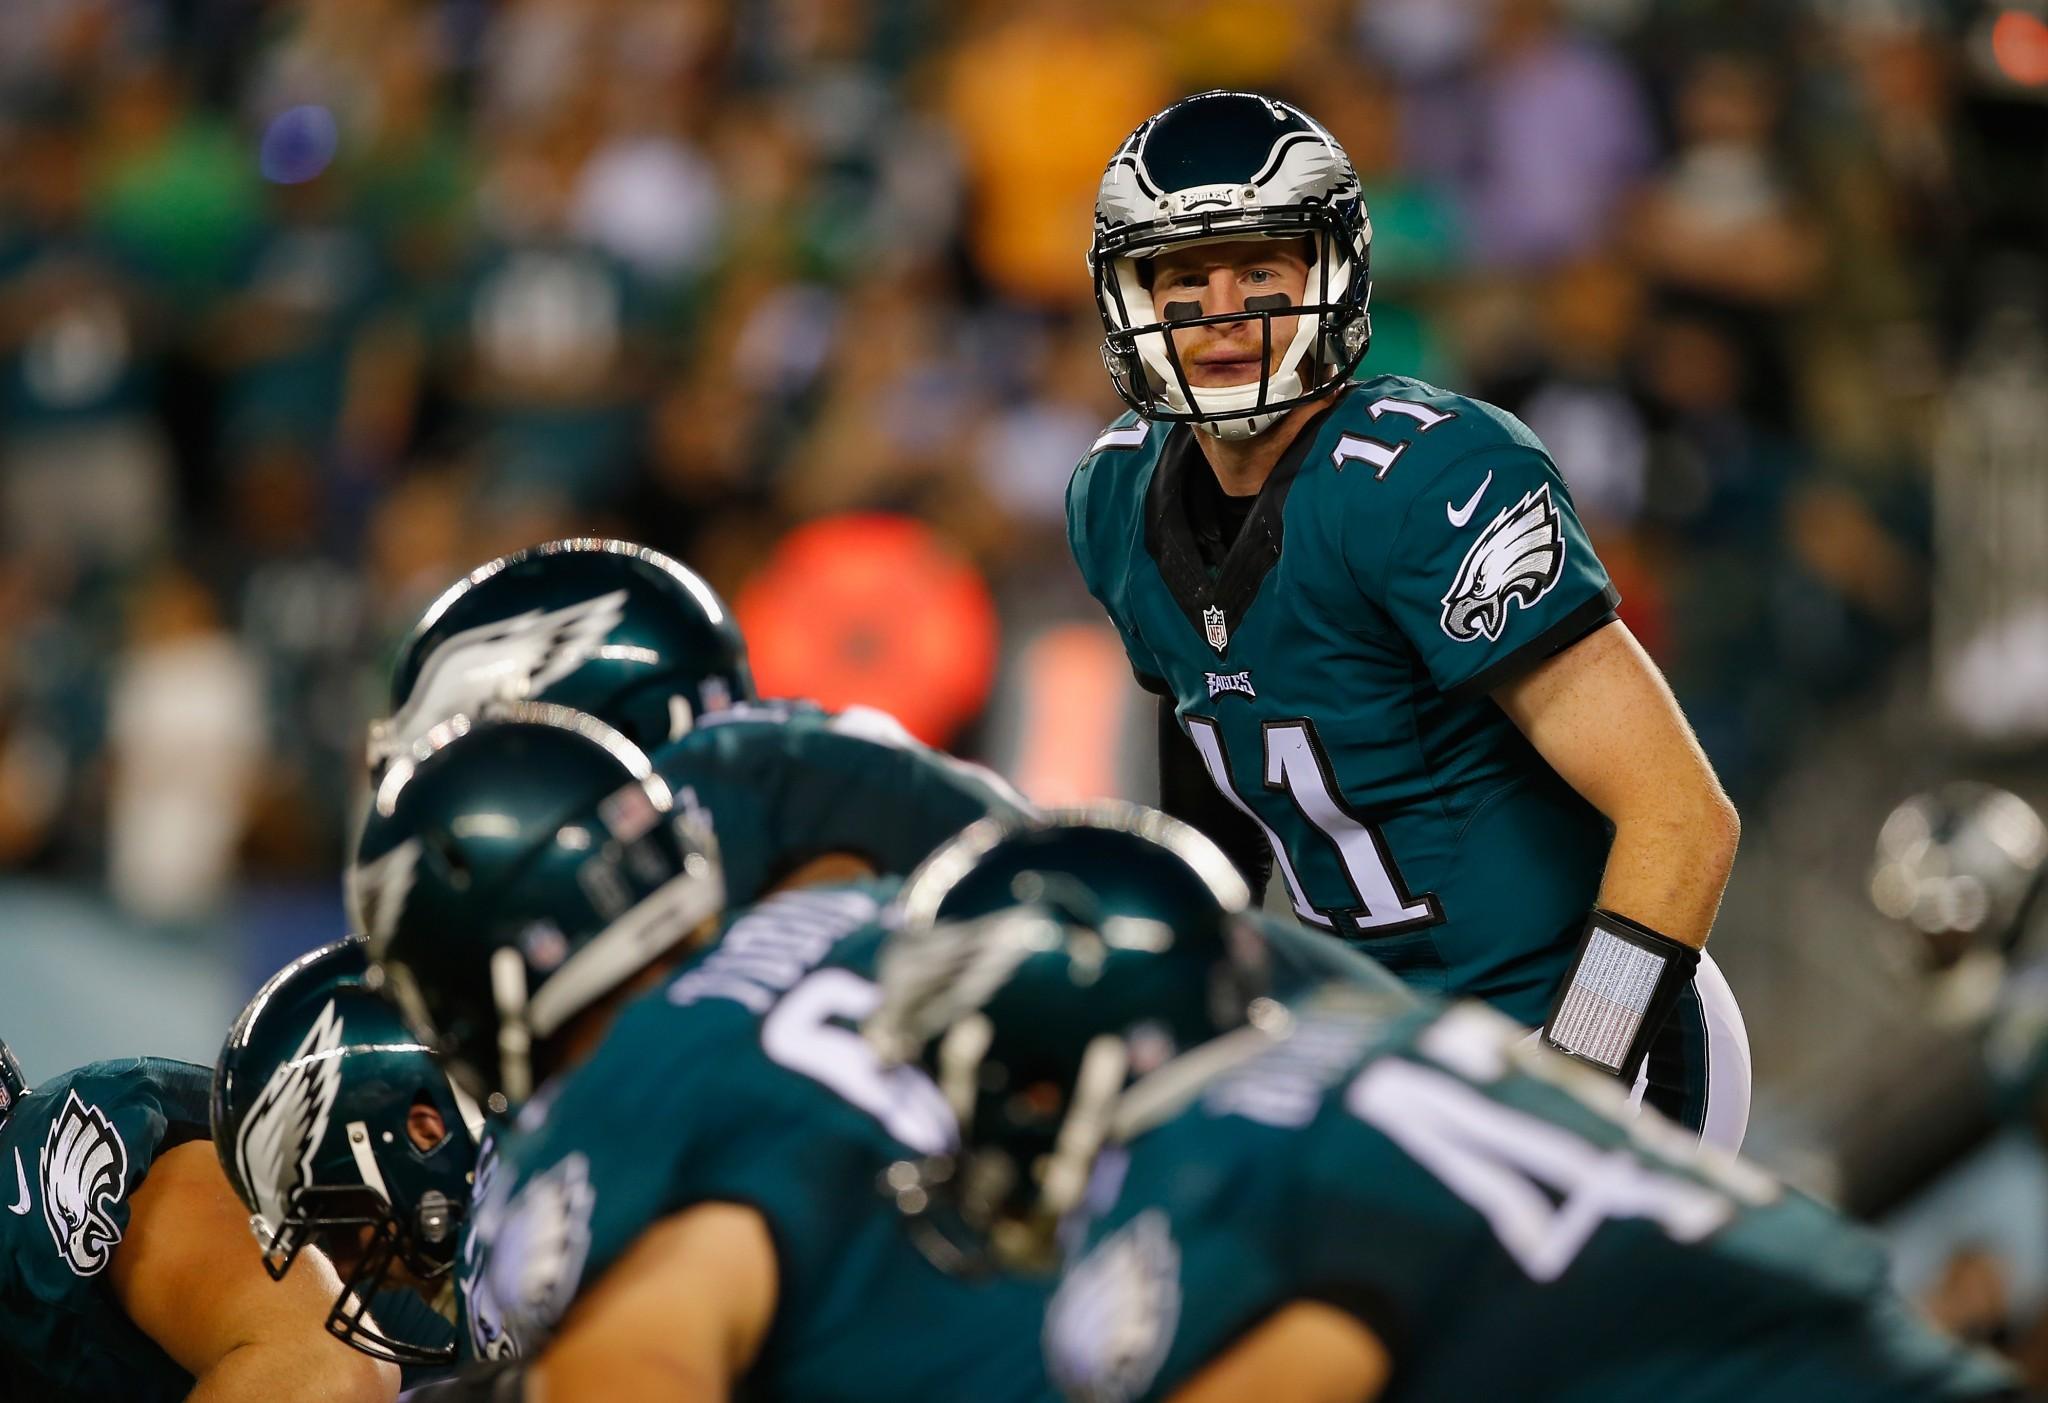 Doug Pederson: Carson Wentz prepares like Peyton Manning